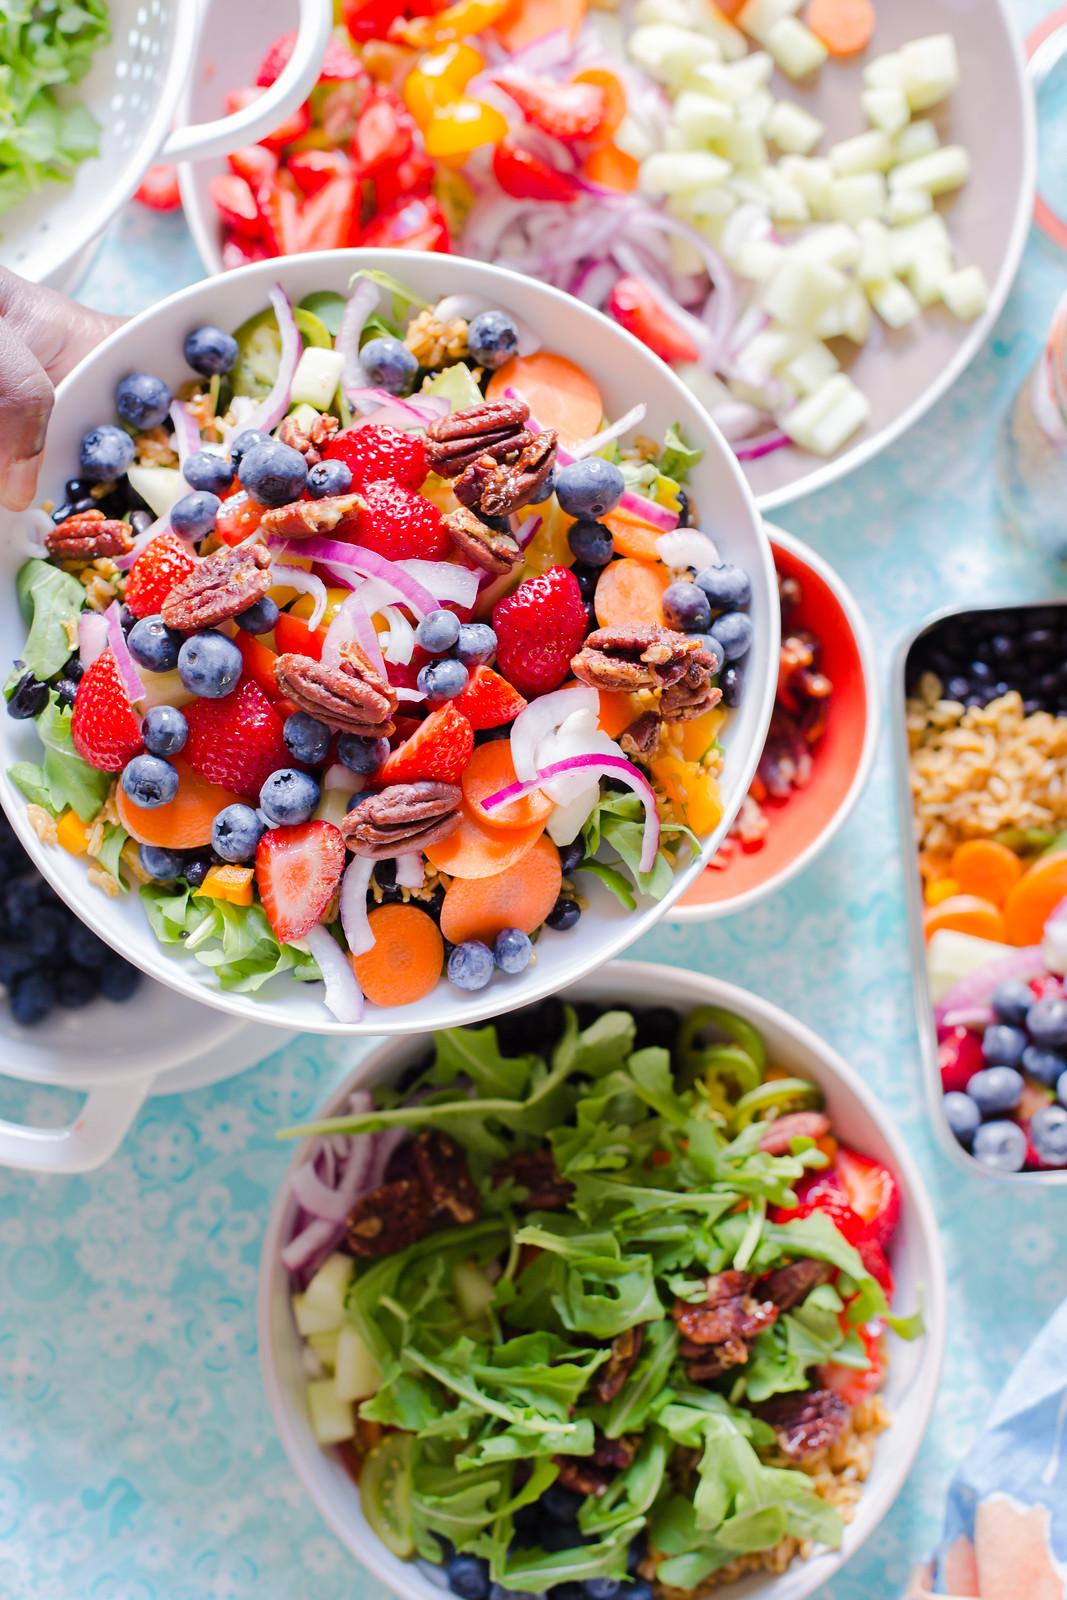 Summer Rice and Black Bean Salad